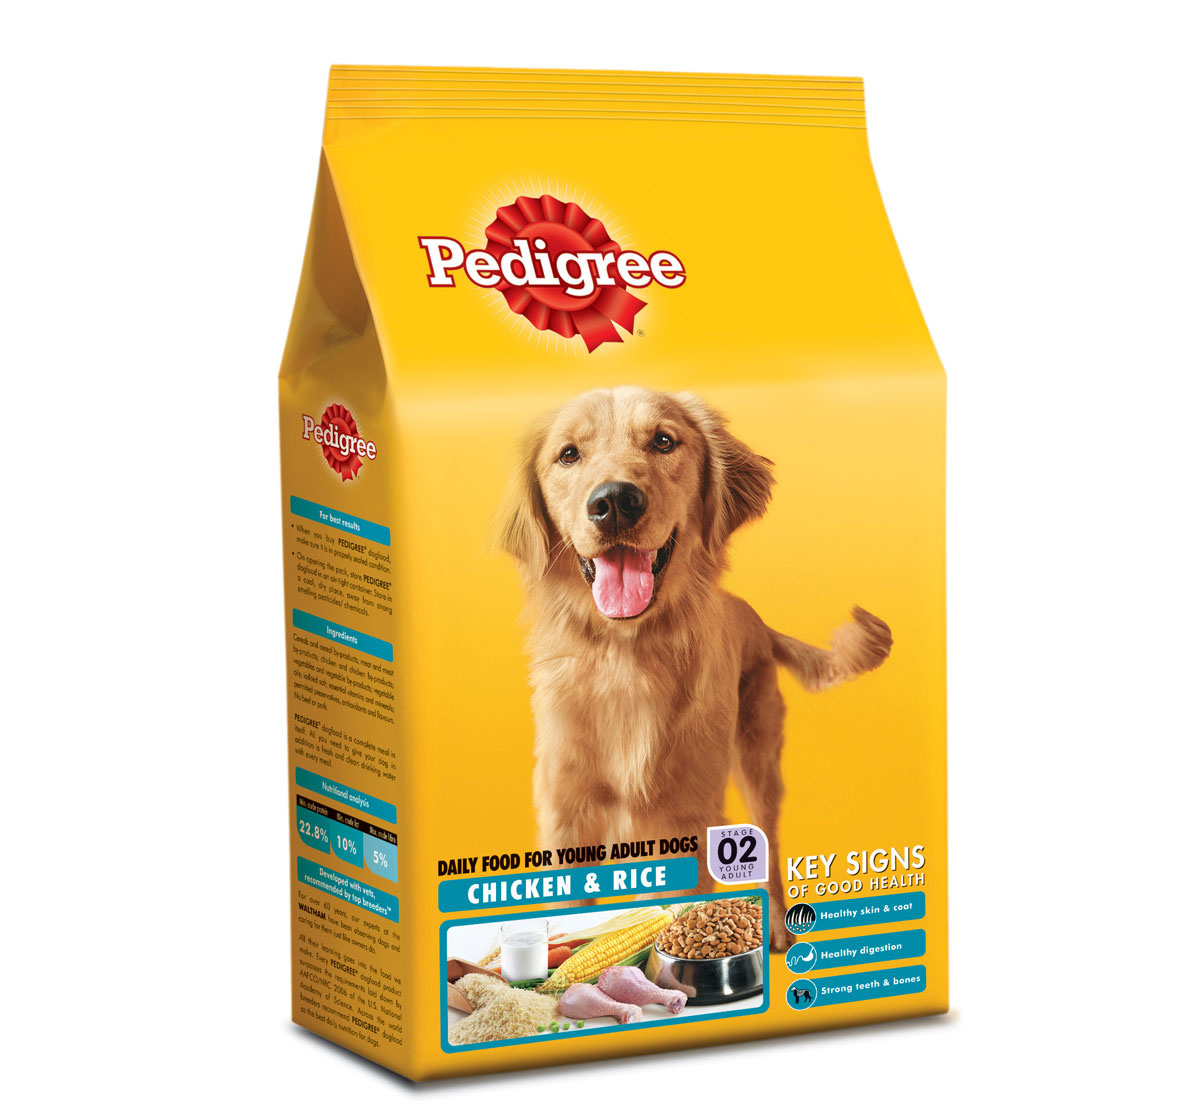 puppy food for adult dog jpg 422x640